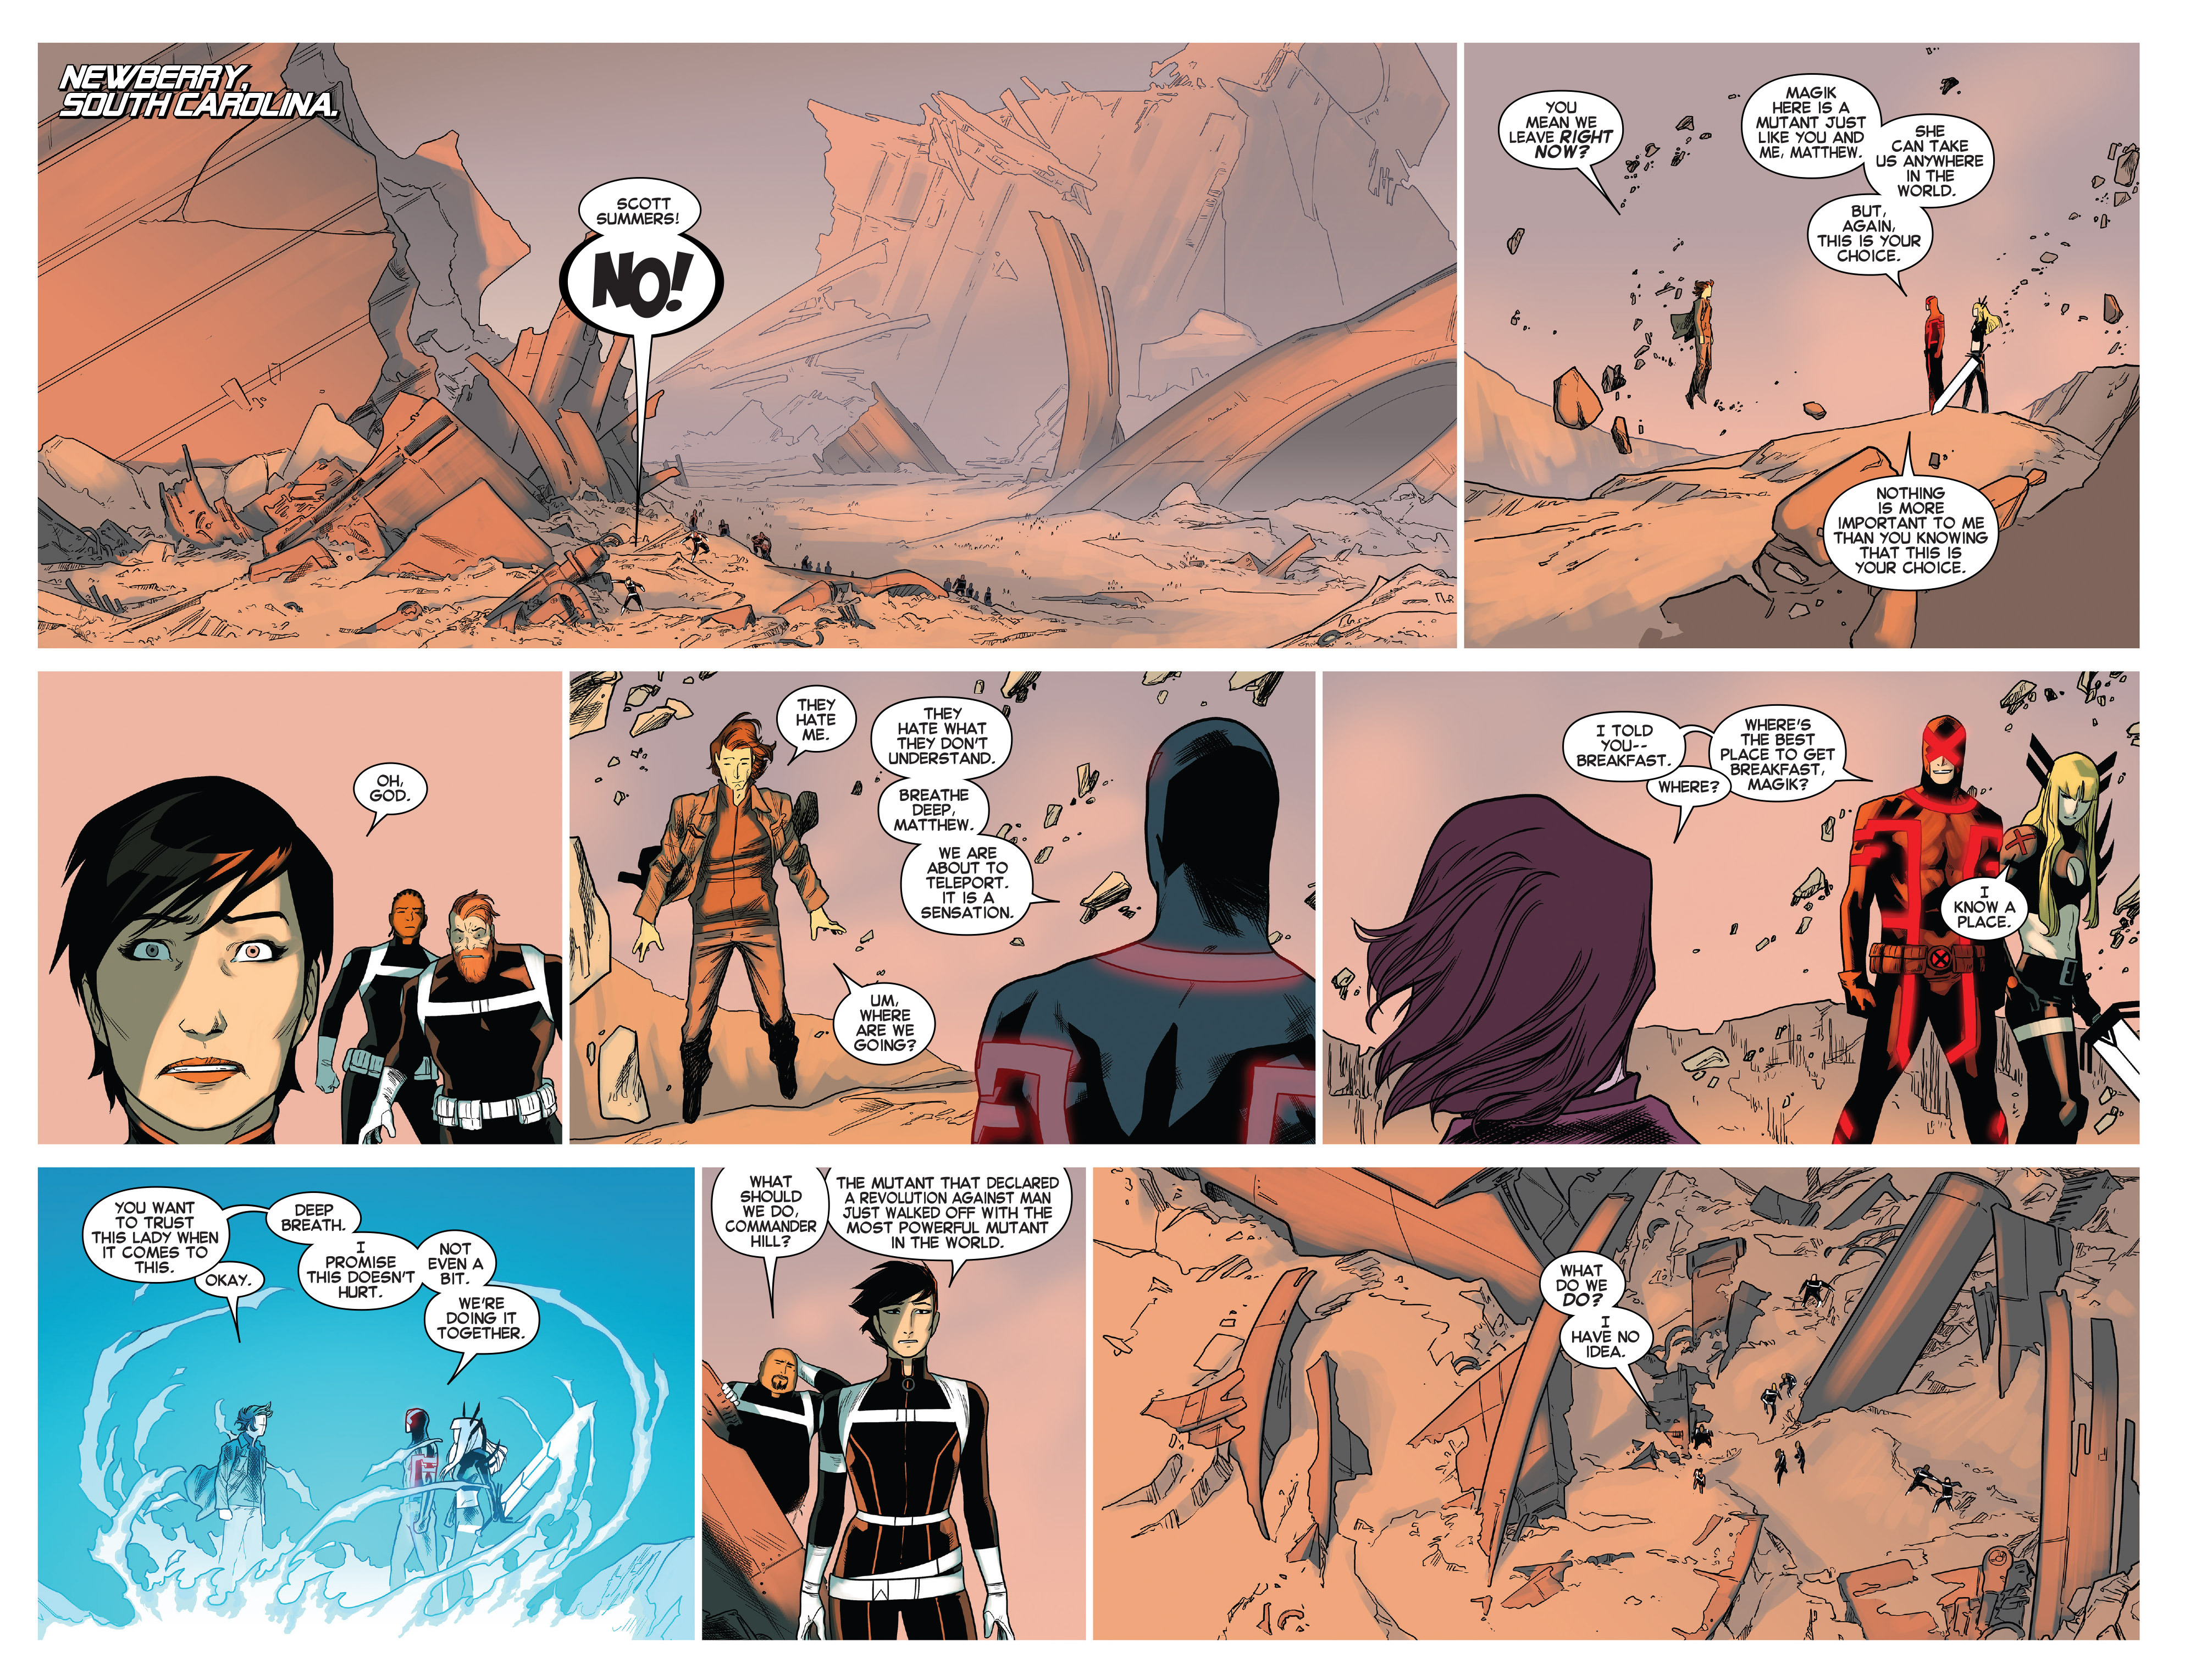 Read online Uncanny X-Men (2013) comic -  Issue # _TPB 5 - The Omega Mutant - 41